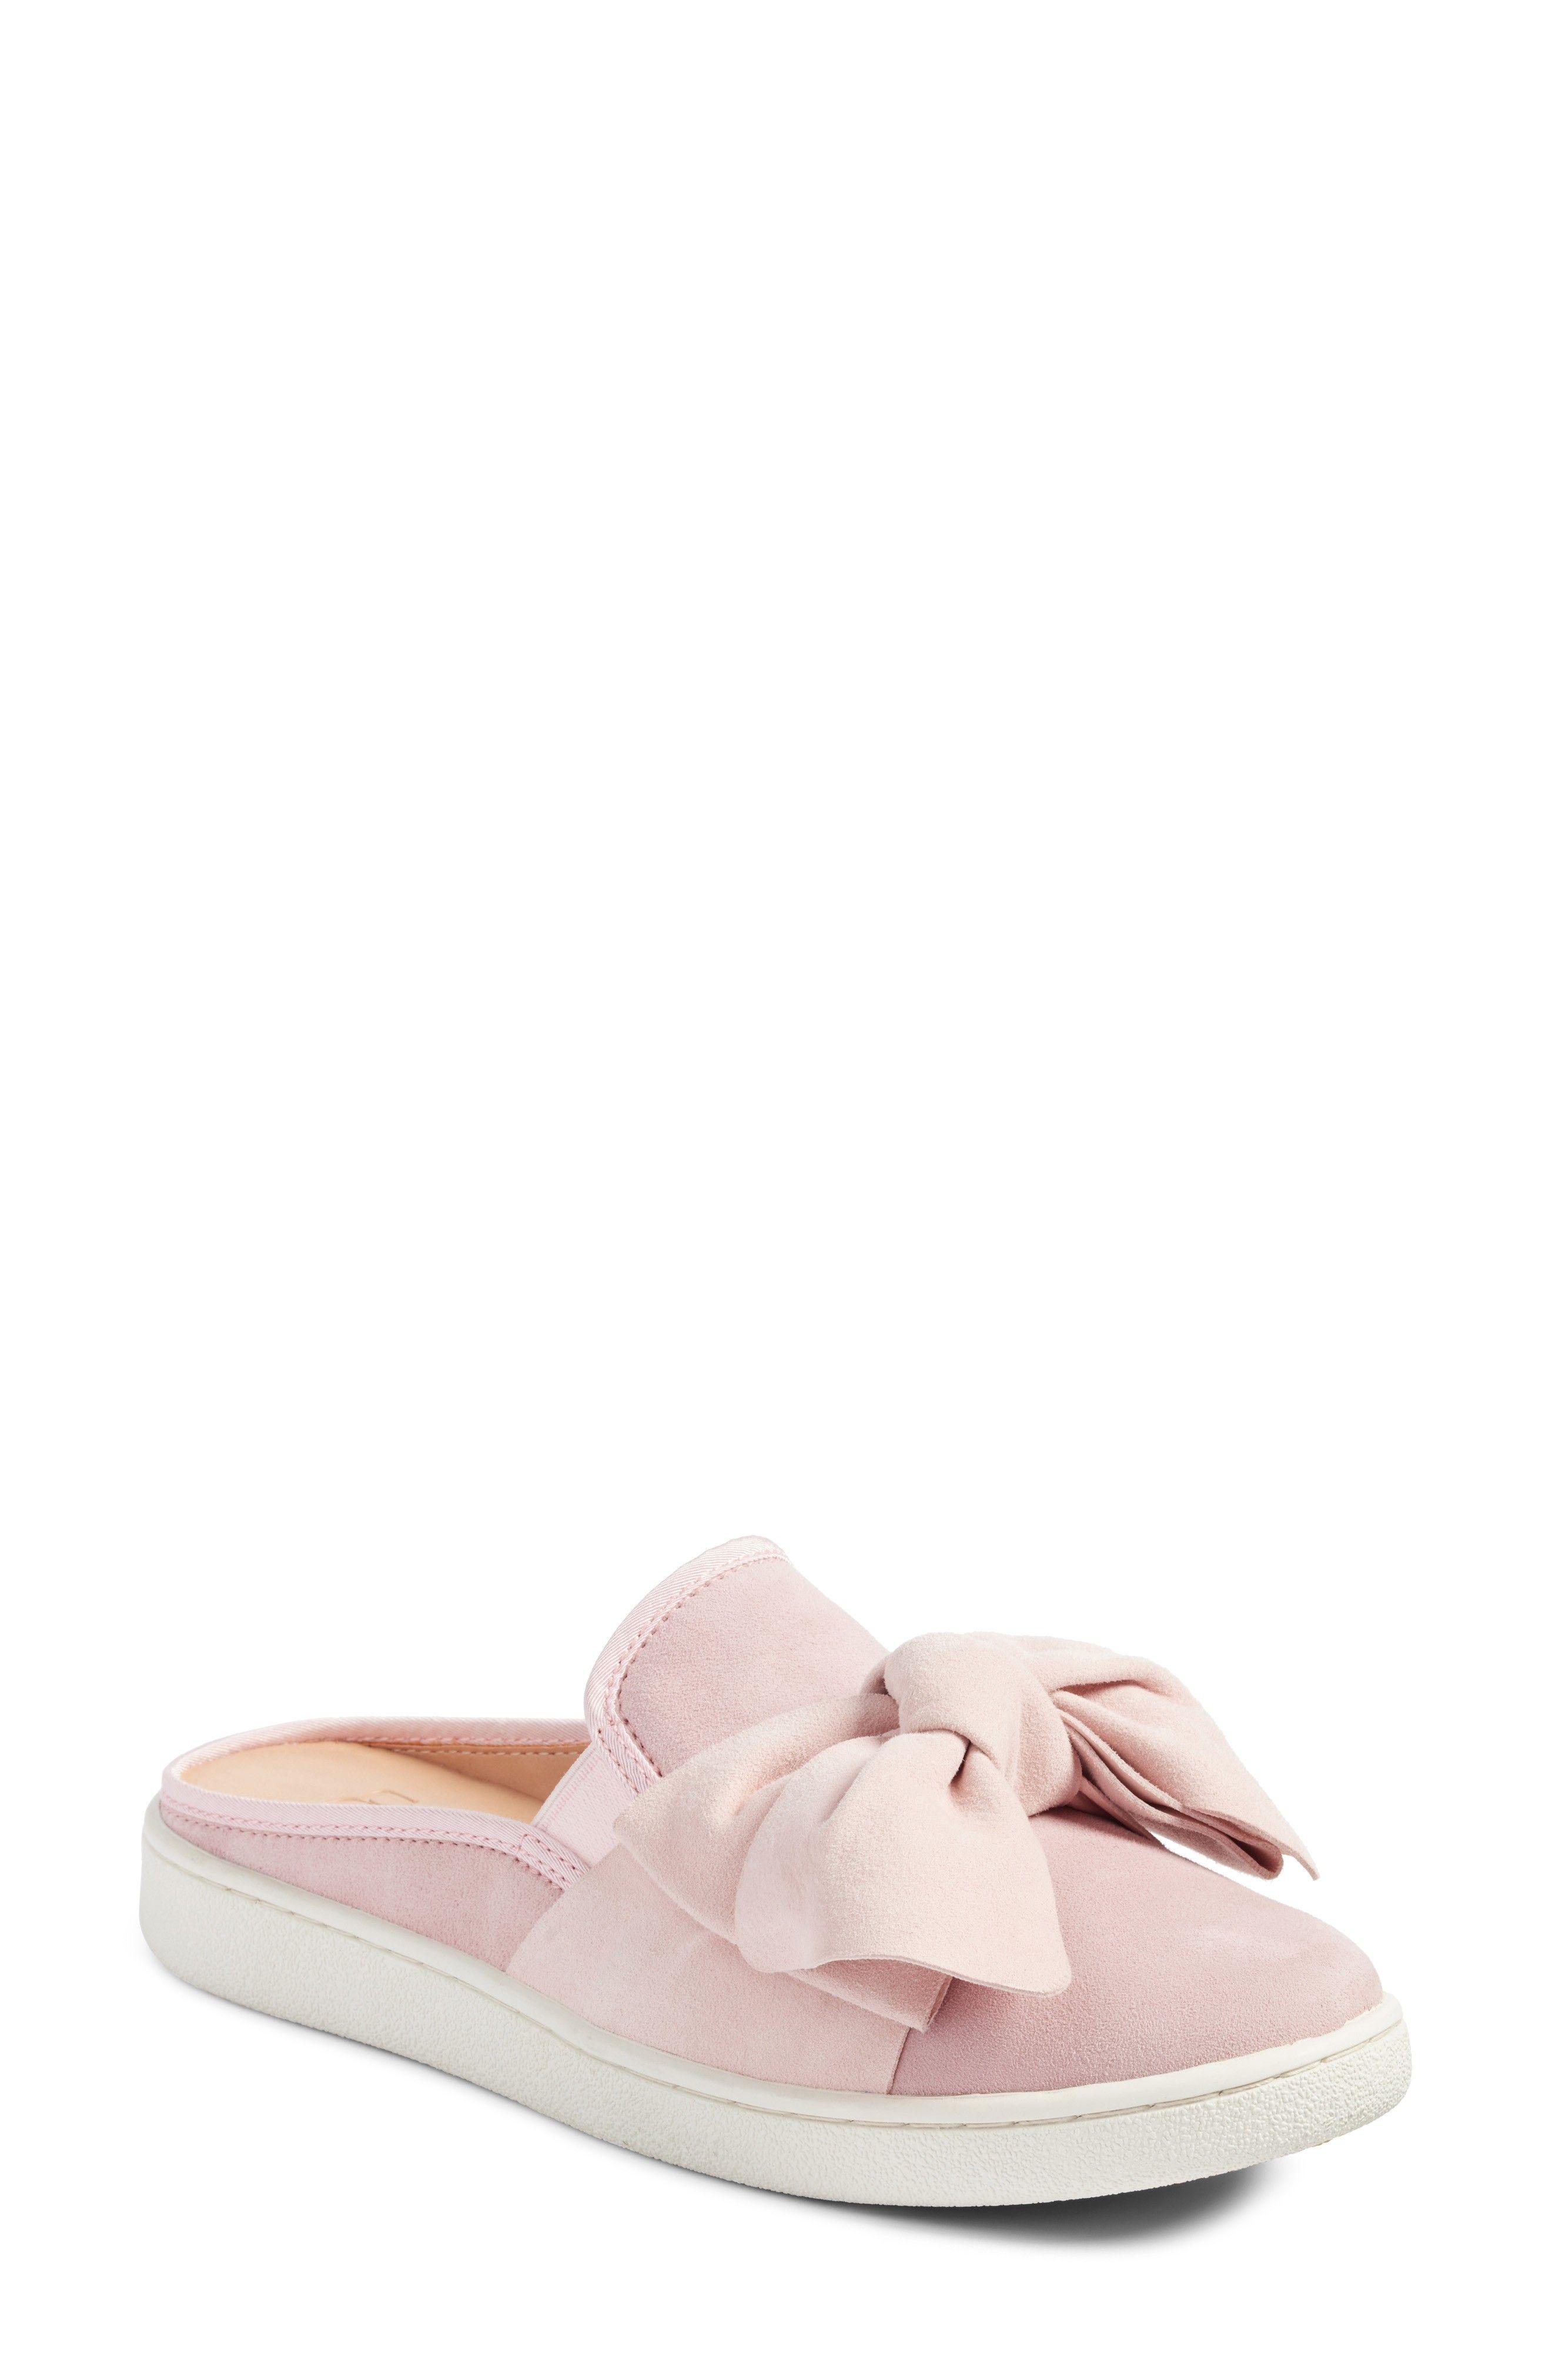 UGG | Luci Bow Sneaker Mule #Shoes #Sneaker #UGG